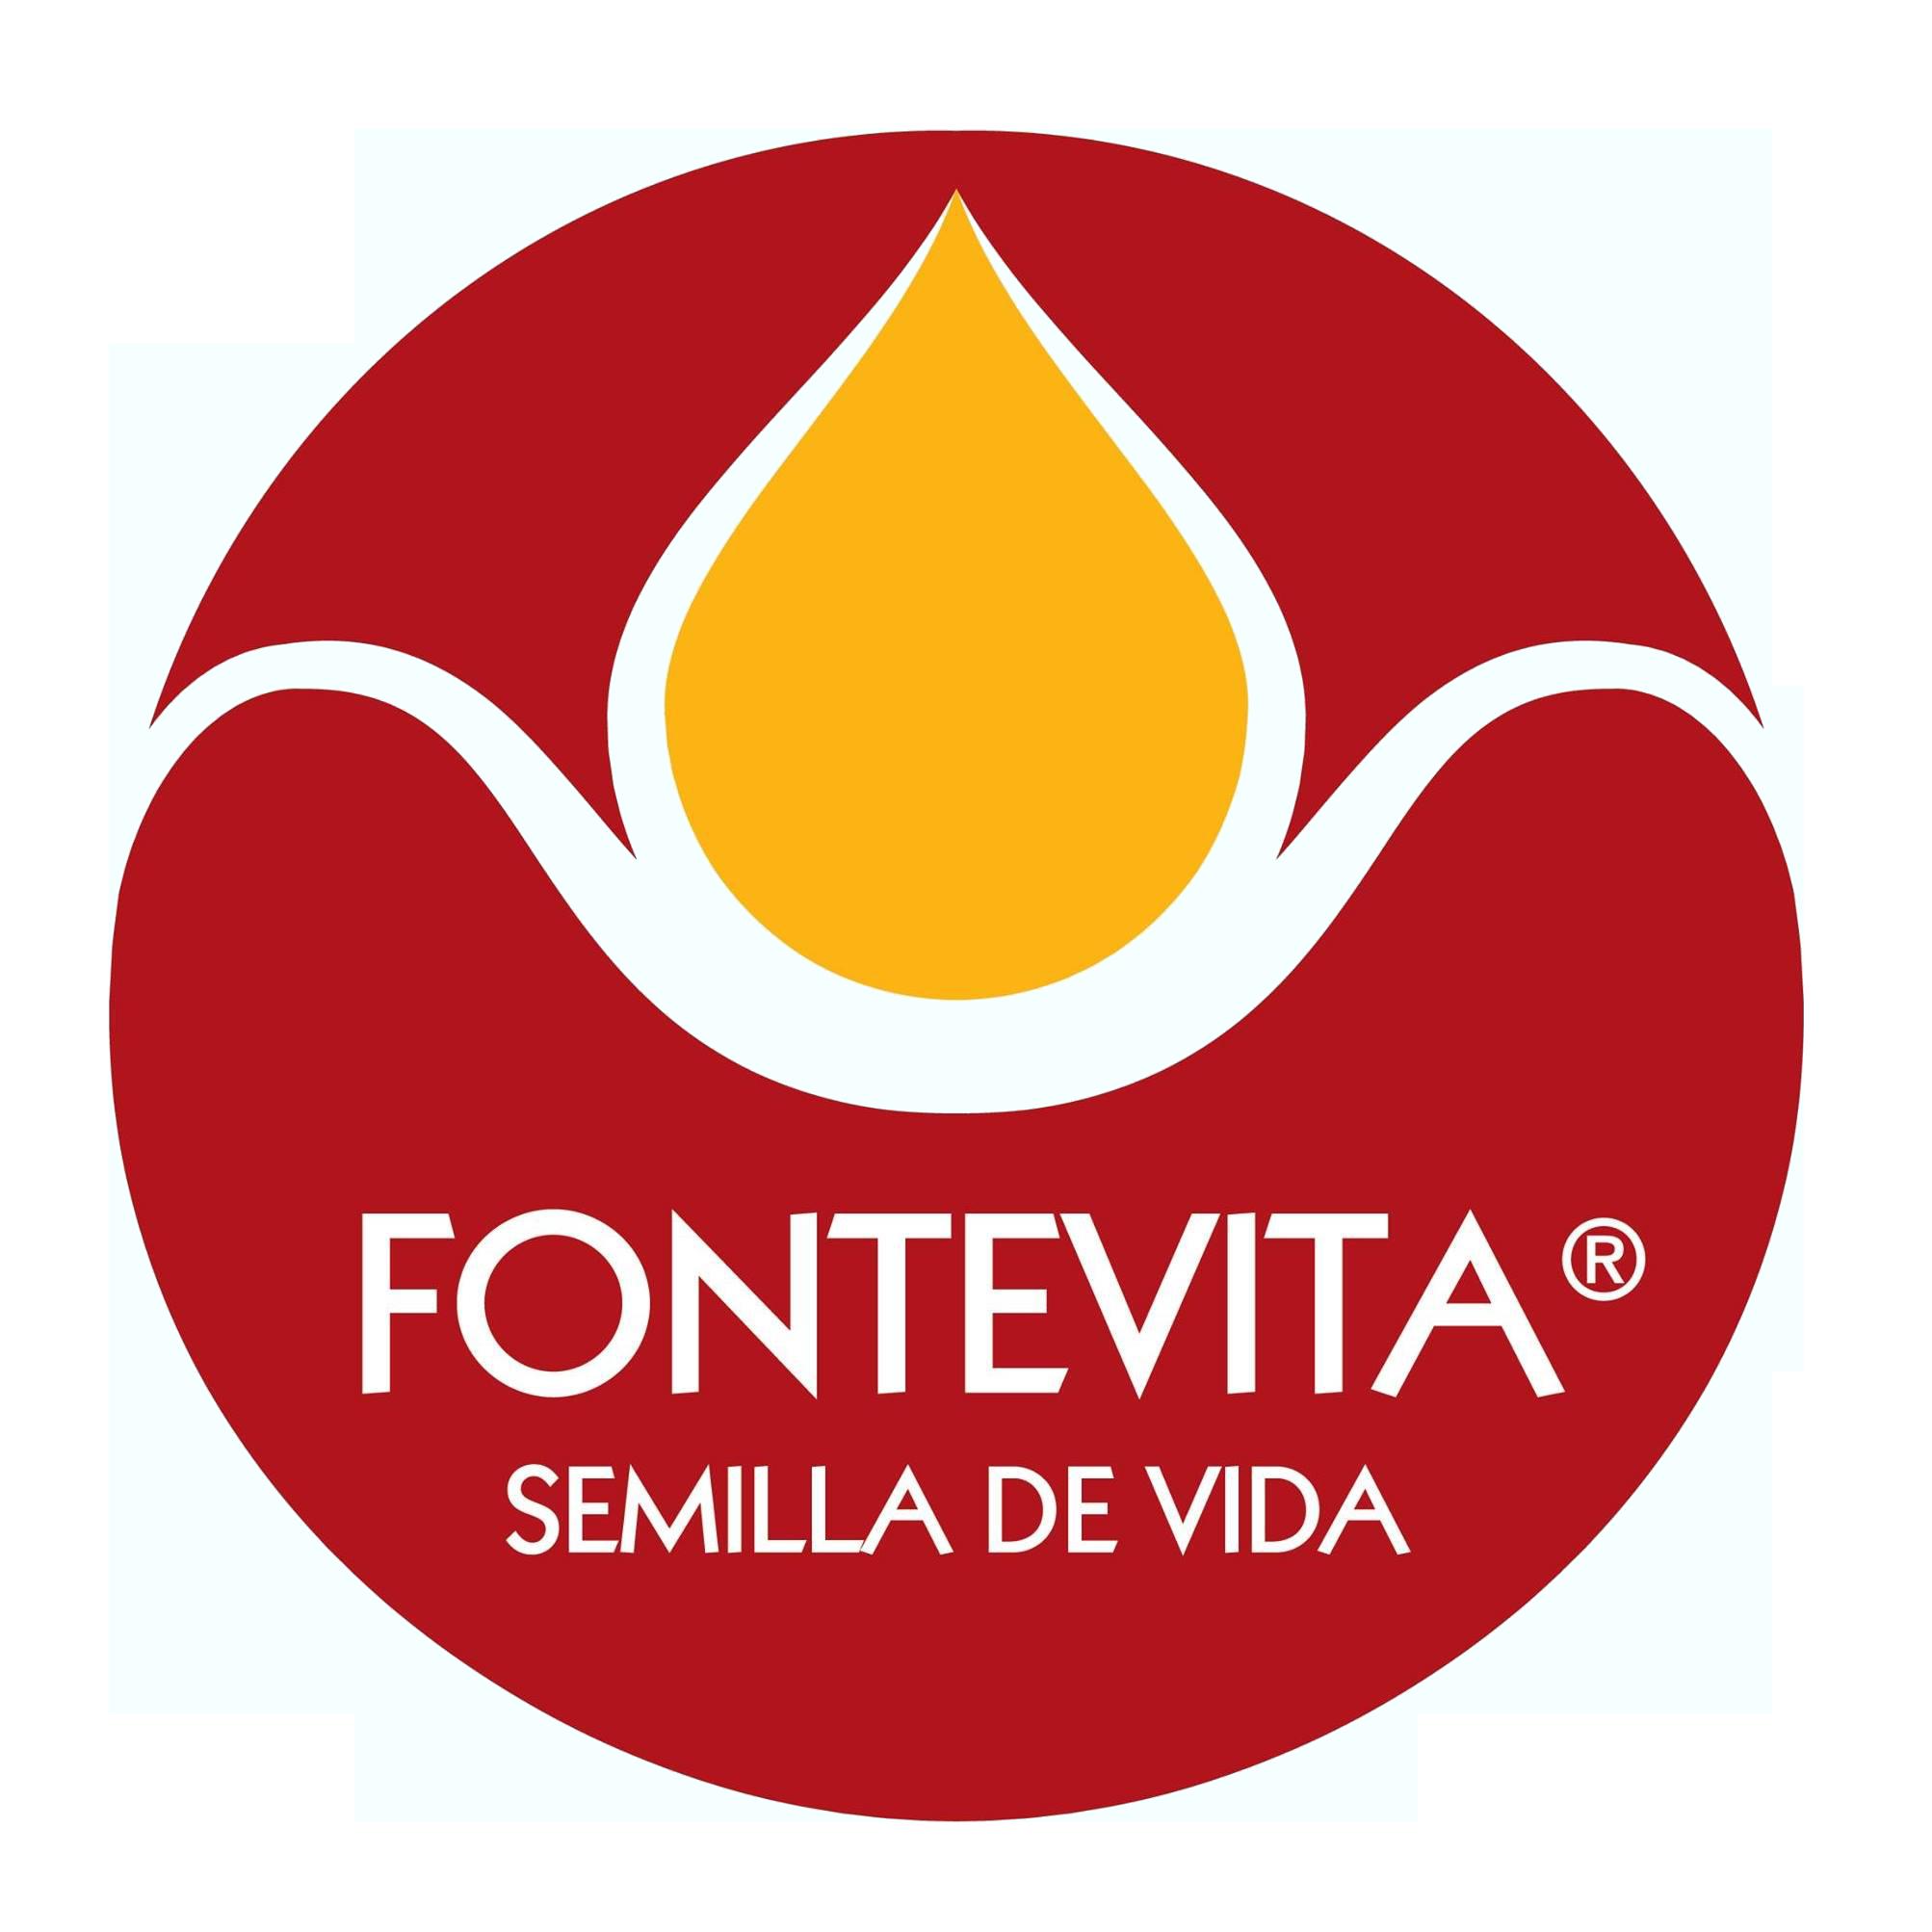 Aceites Fontevita